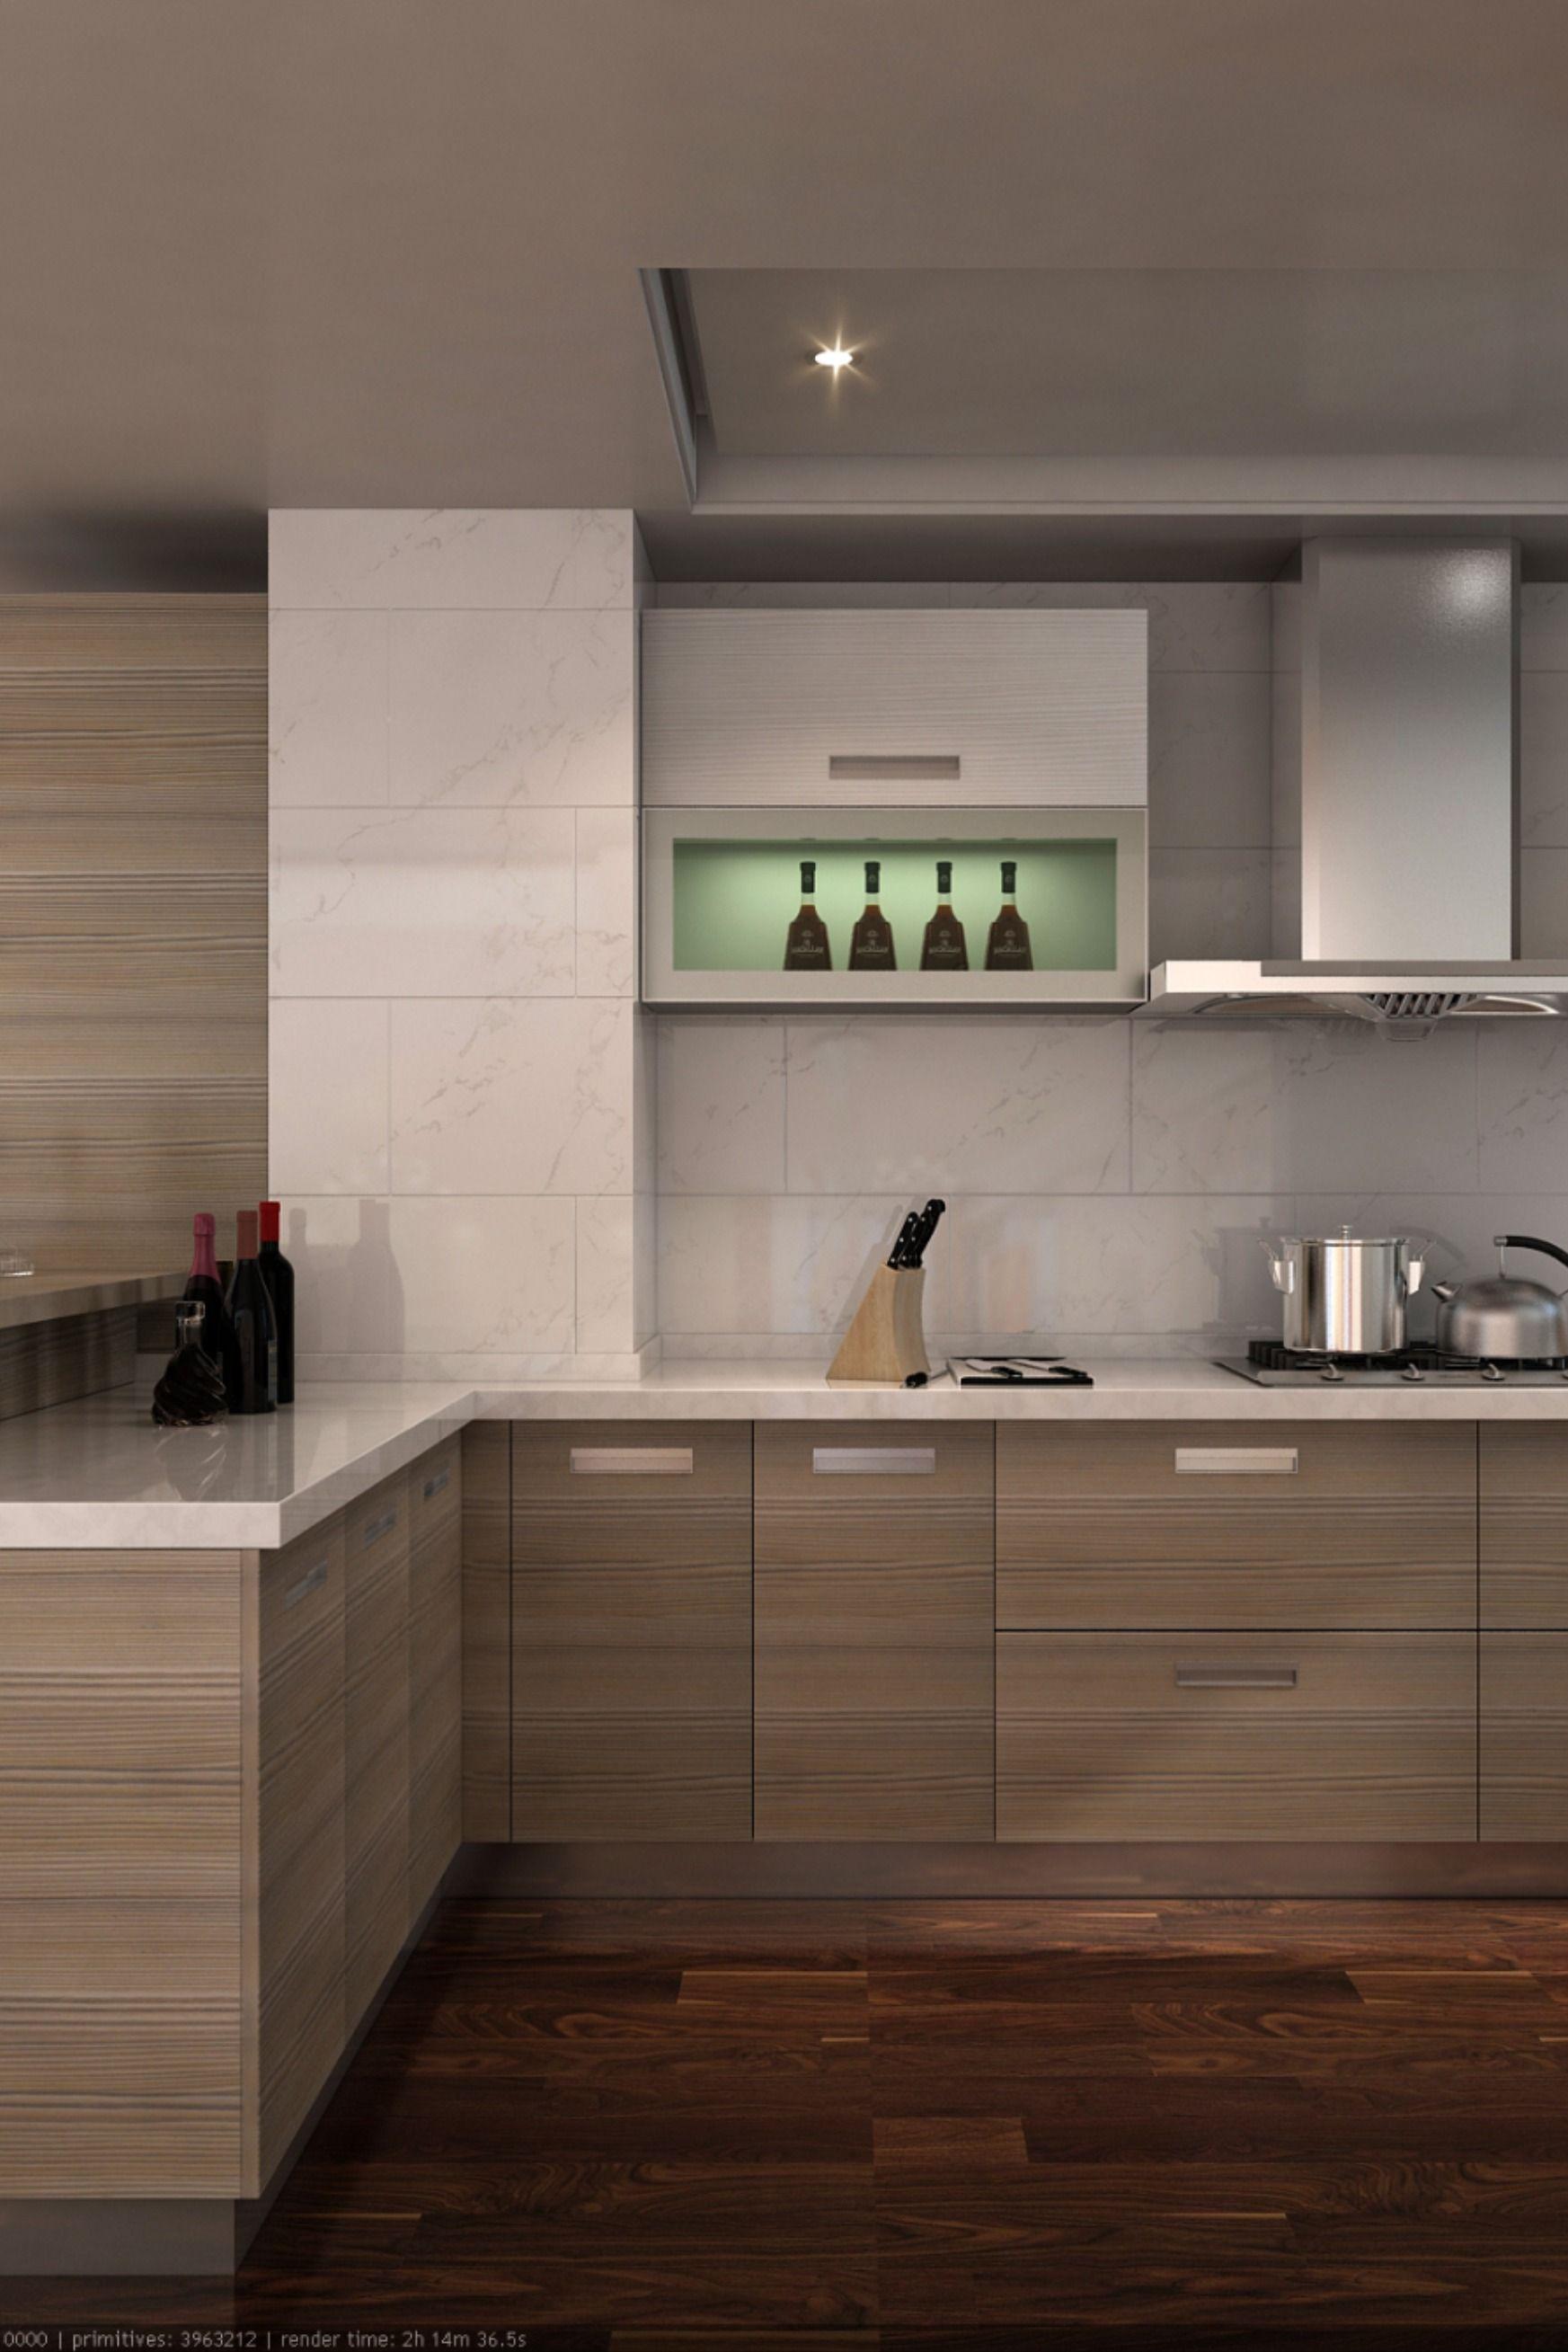 Hpl Kitchen Cabinet Georgebuildings Modern Kitchen Cabinet Design Kitchen Furniture Design Kitchen Remodel Small